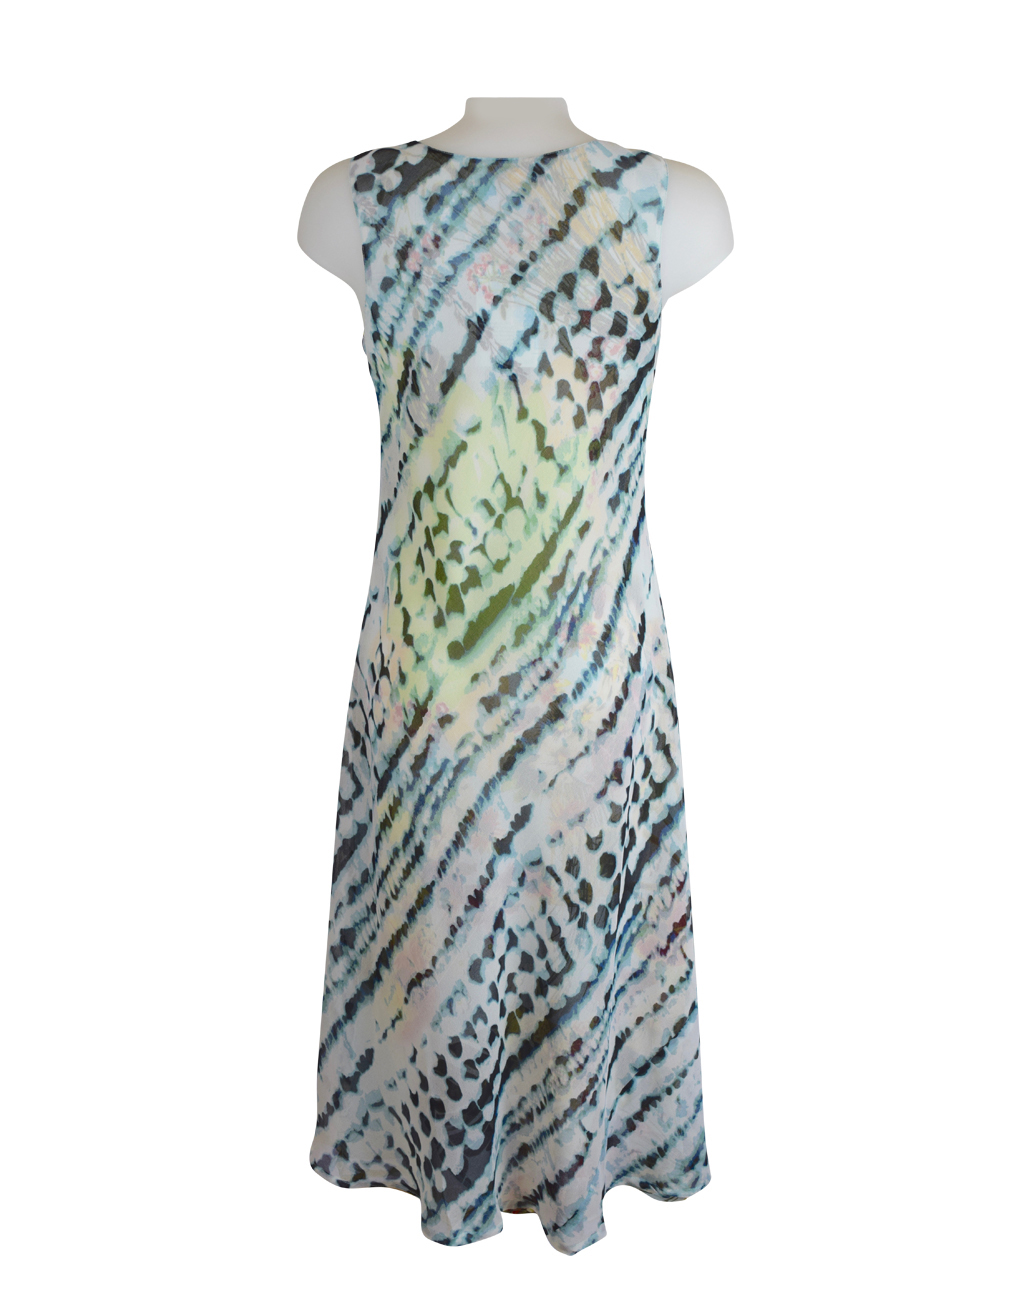 Paramour Reversible 2 In 1 Sleeveless Dress Orange Floral / Snake Print D